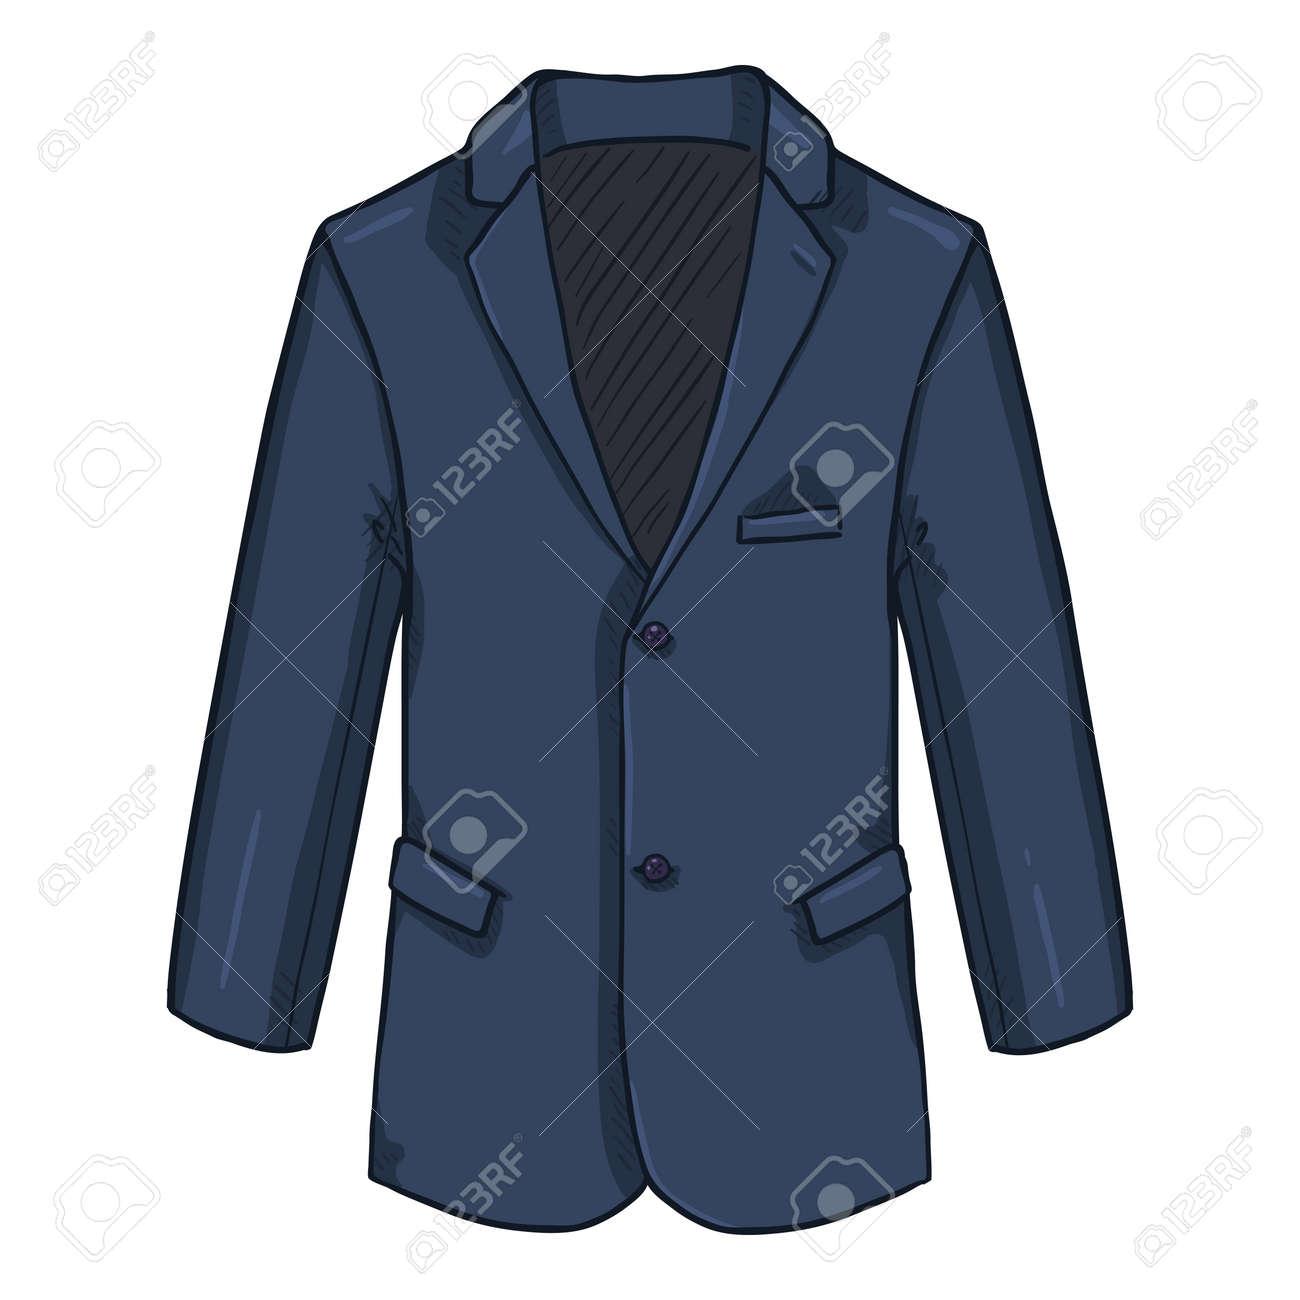 Blazer. Business Suit Blue Jacket Vector Cartoon Illustration. - 169663649